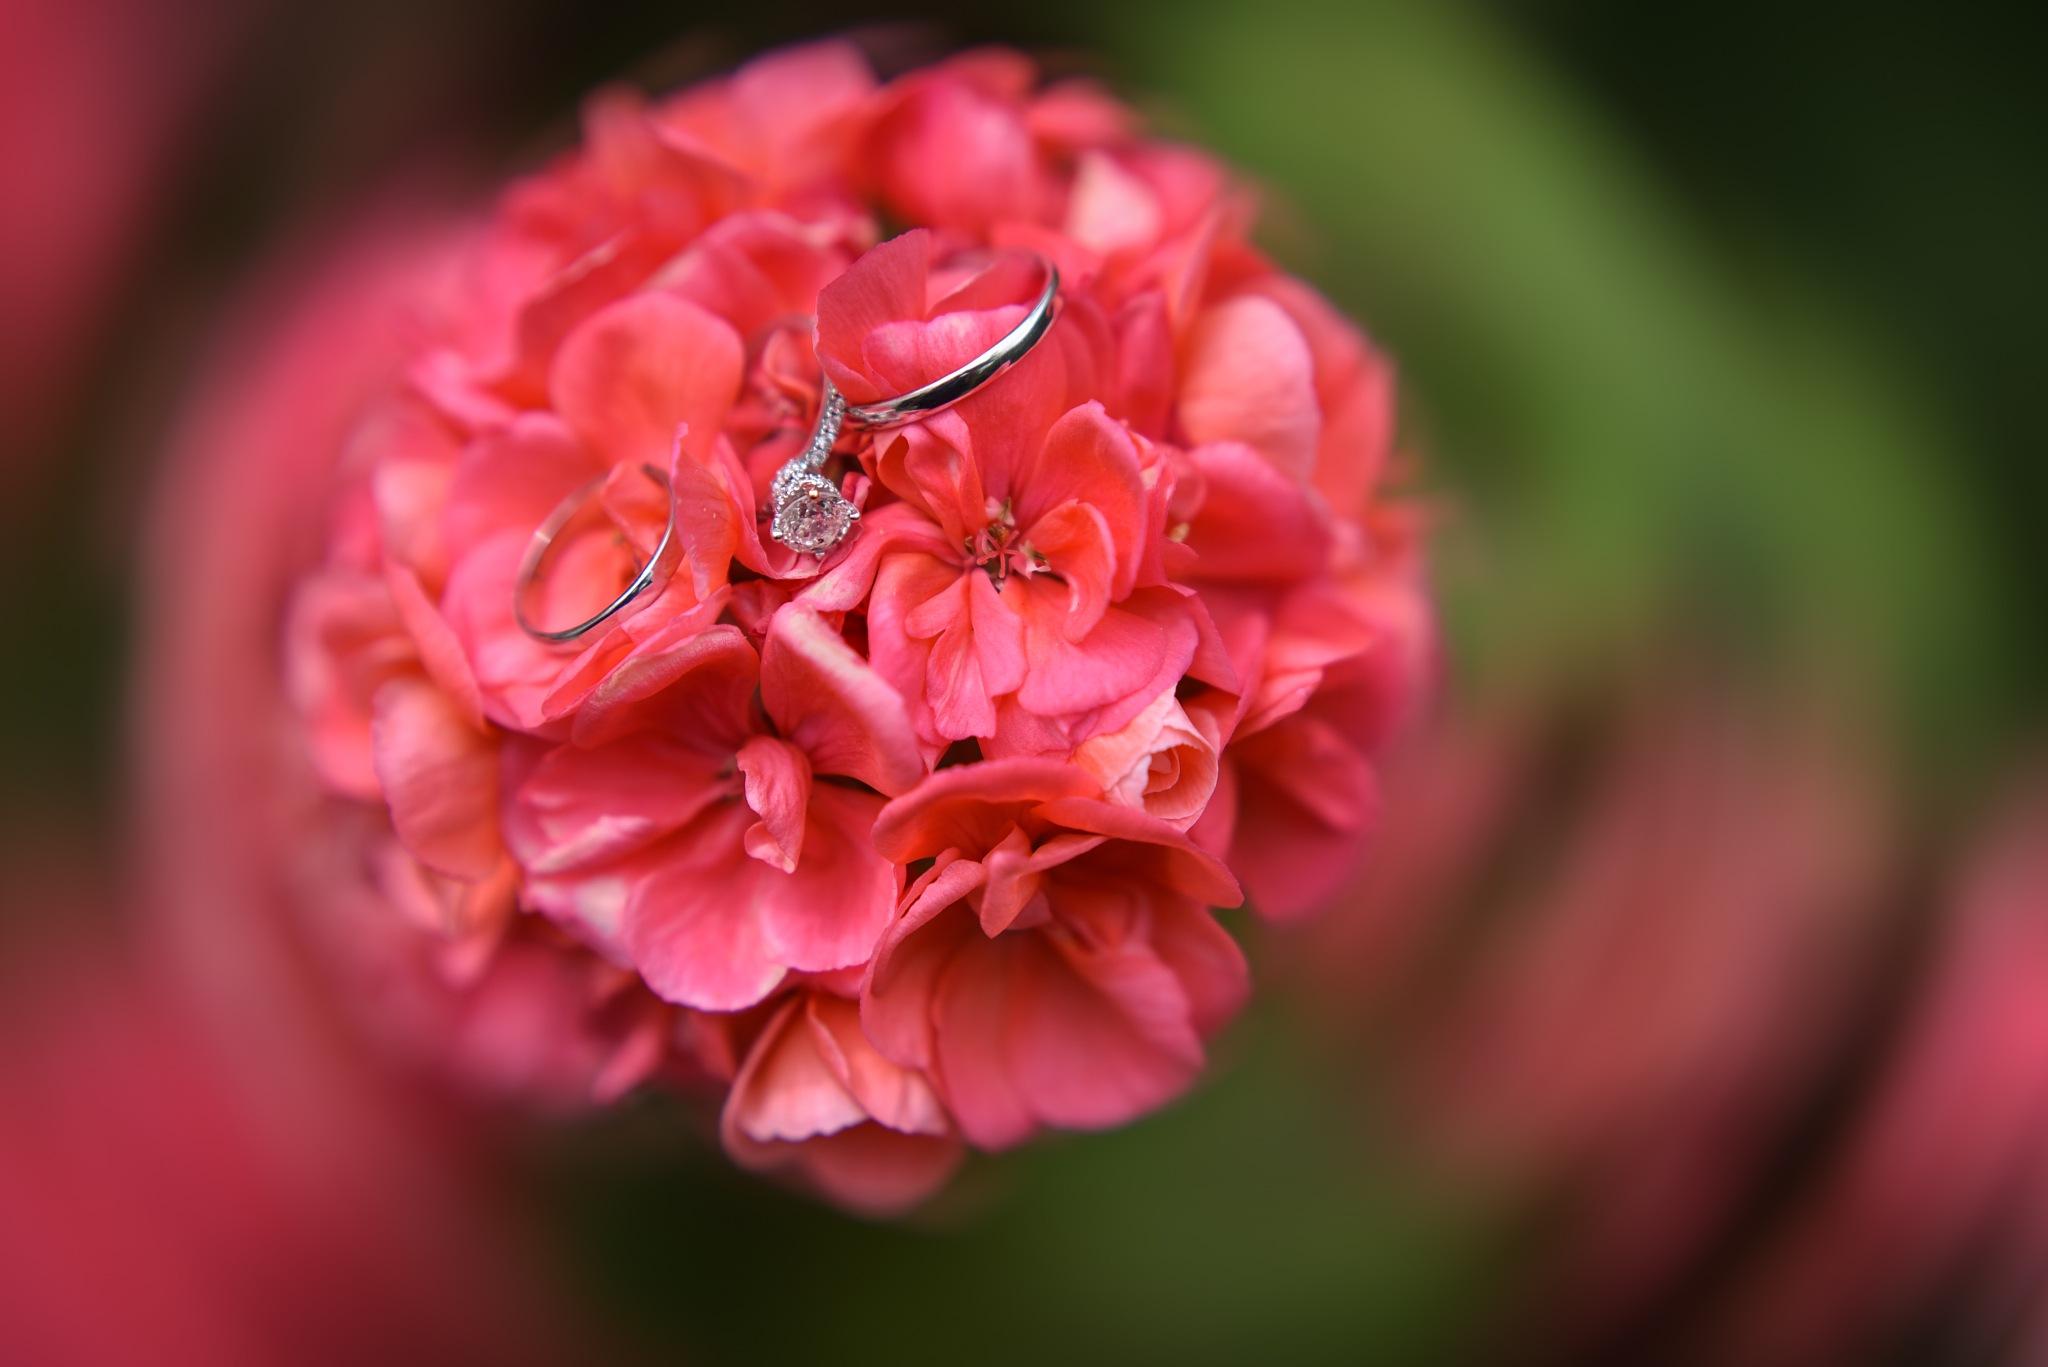 Rings by Ido Shahar